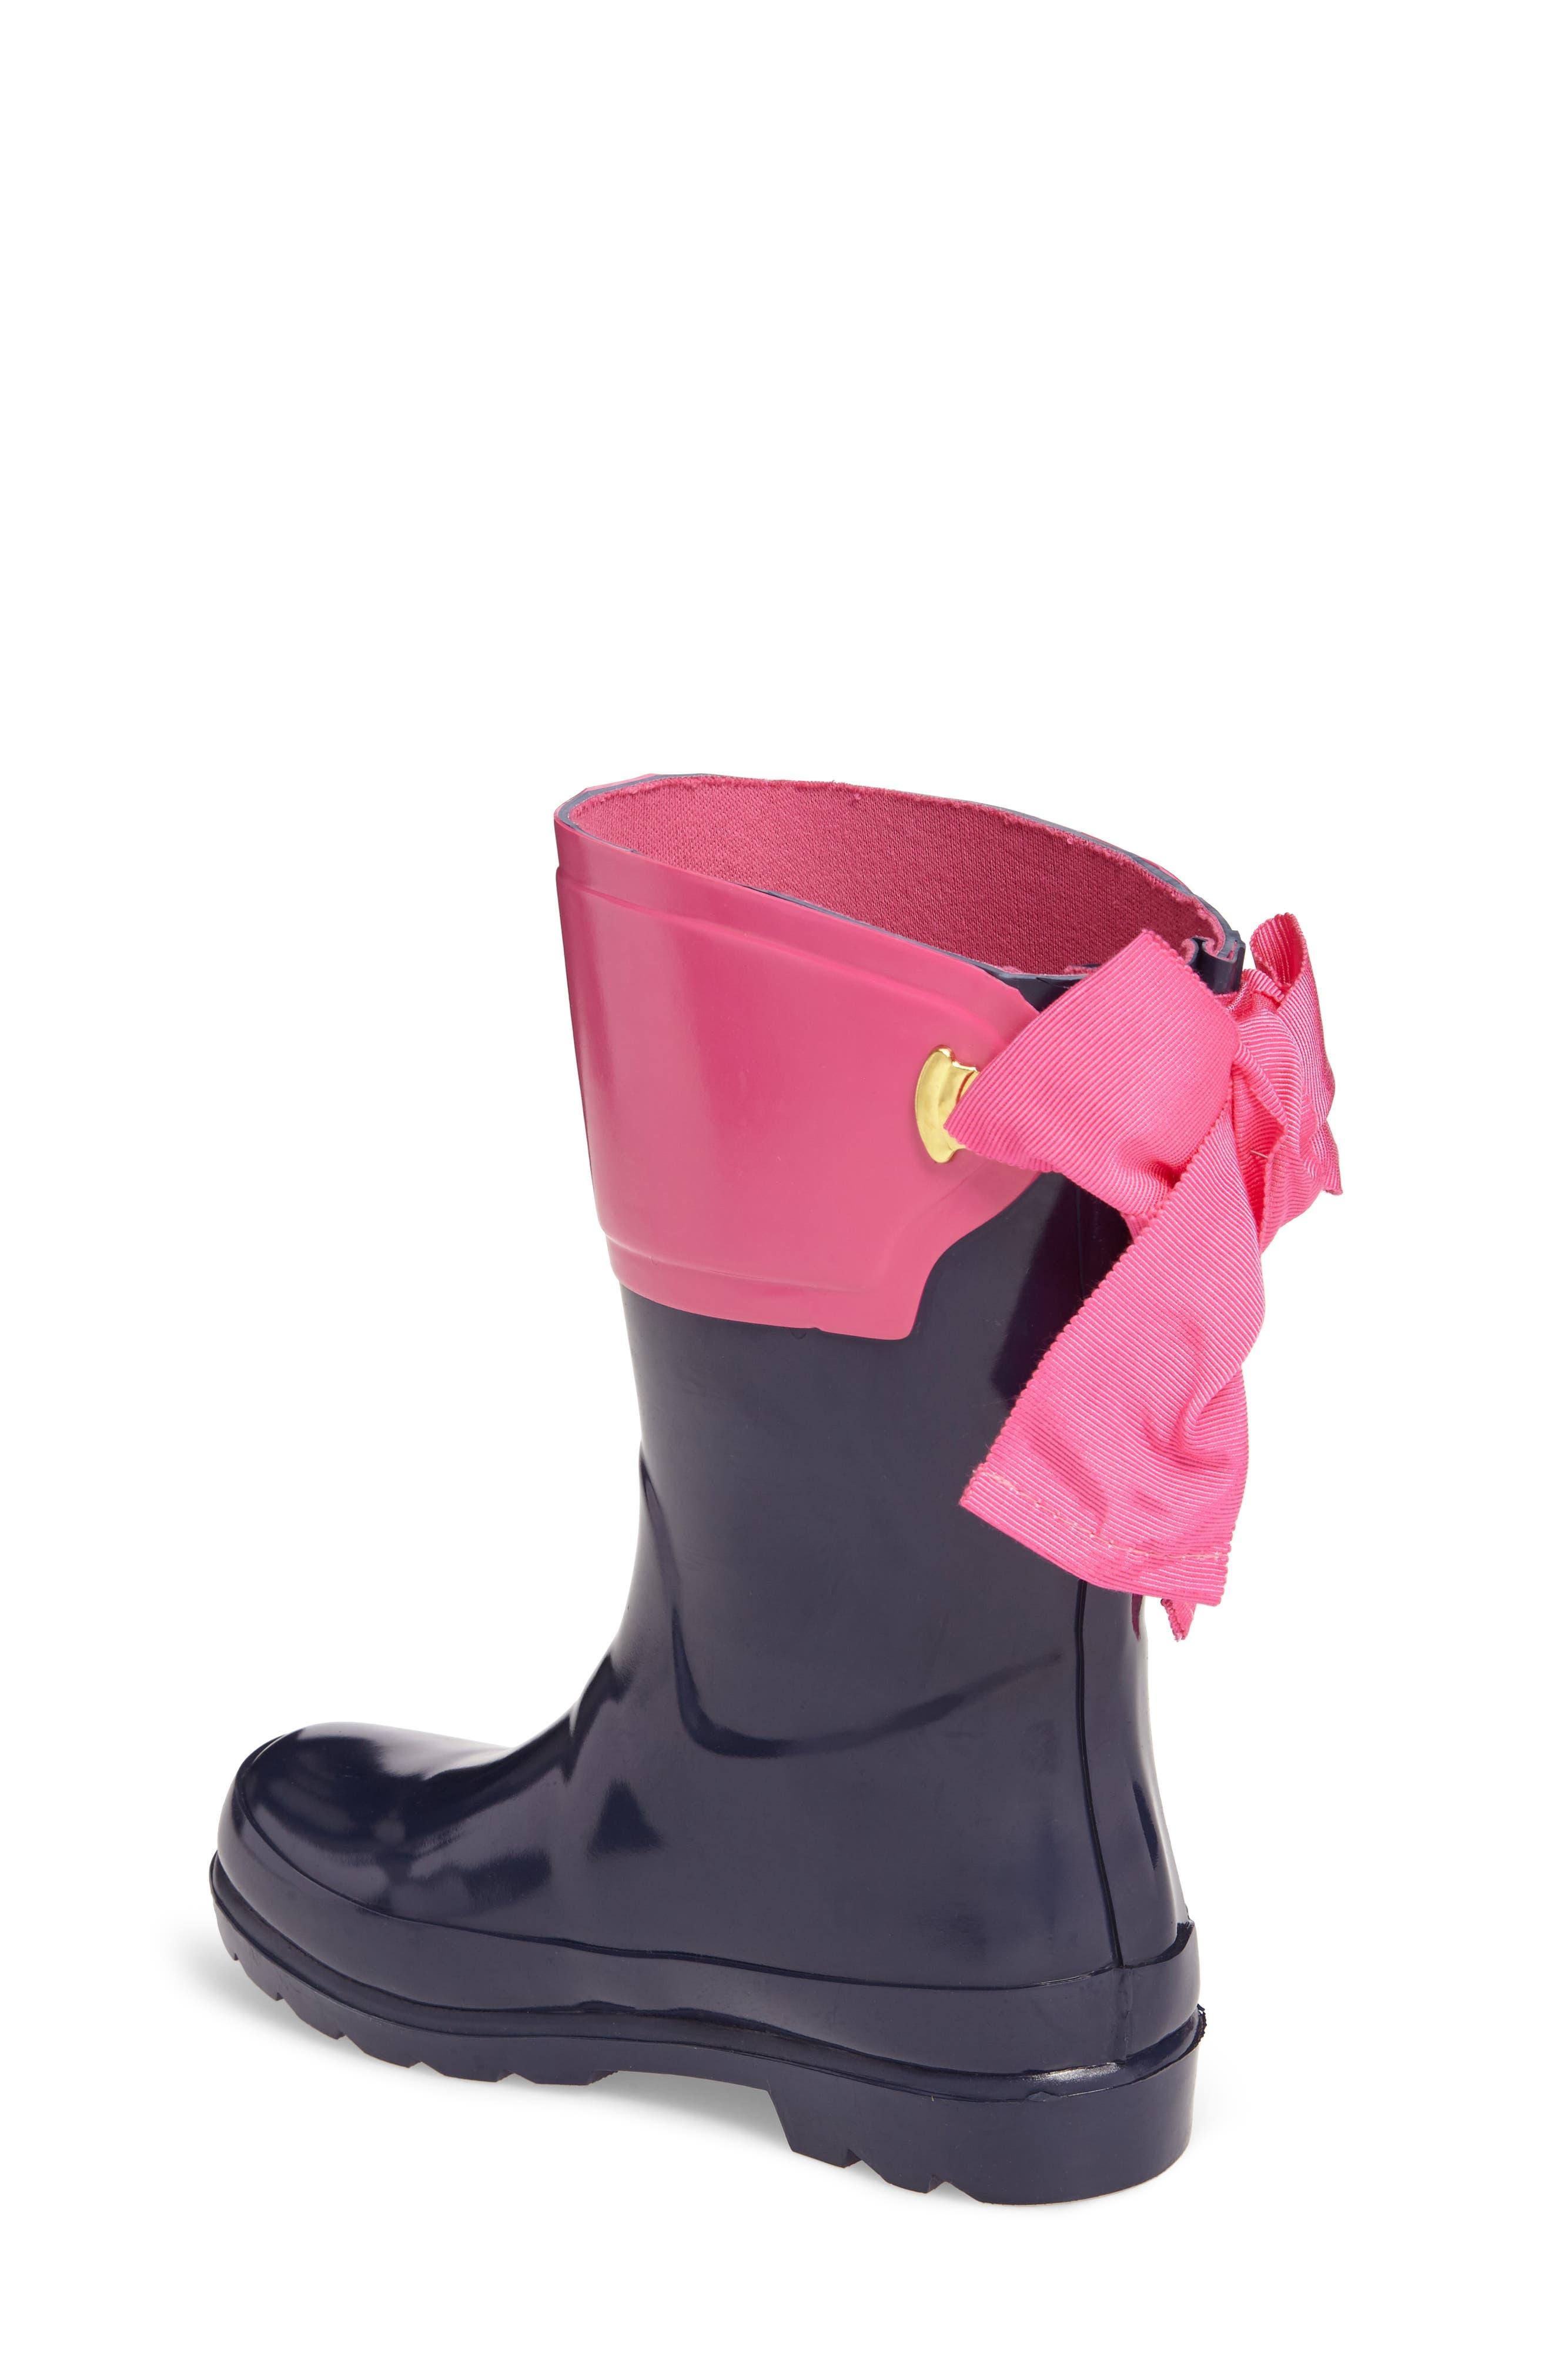 Evedon Bow Waterproof Rain Boot,                             Alternate thumbnail 2, color,                             400